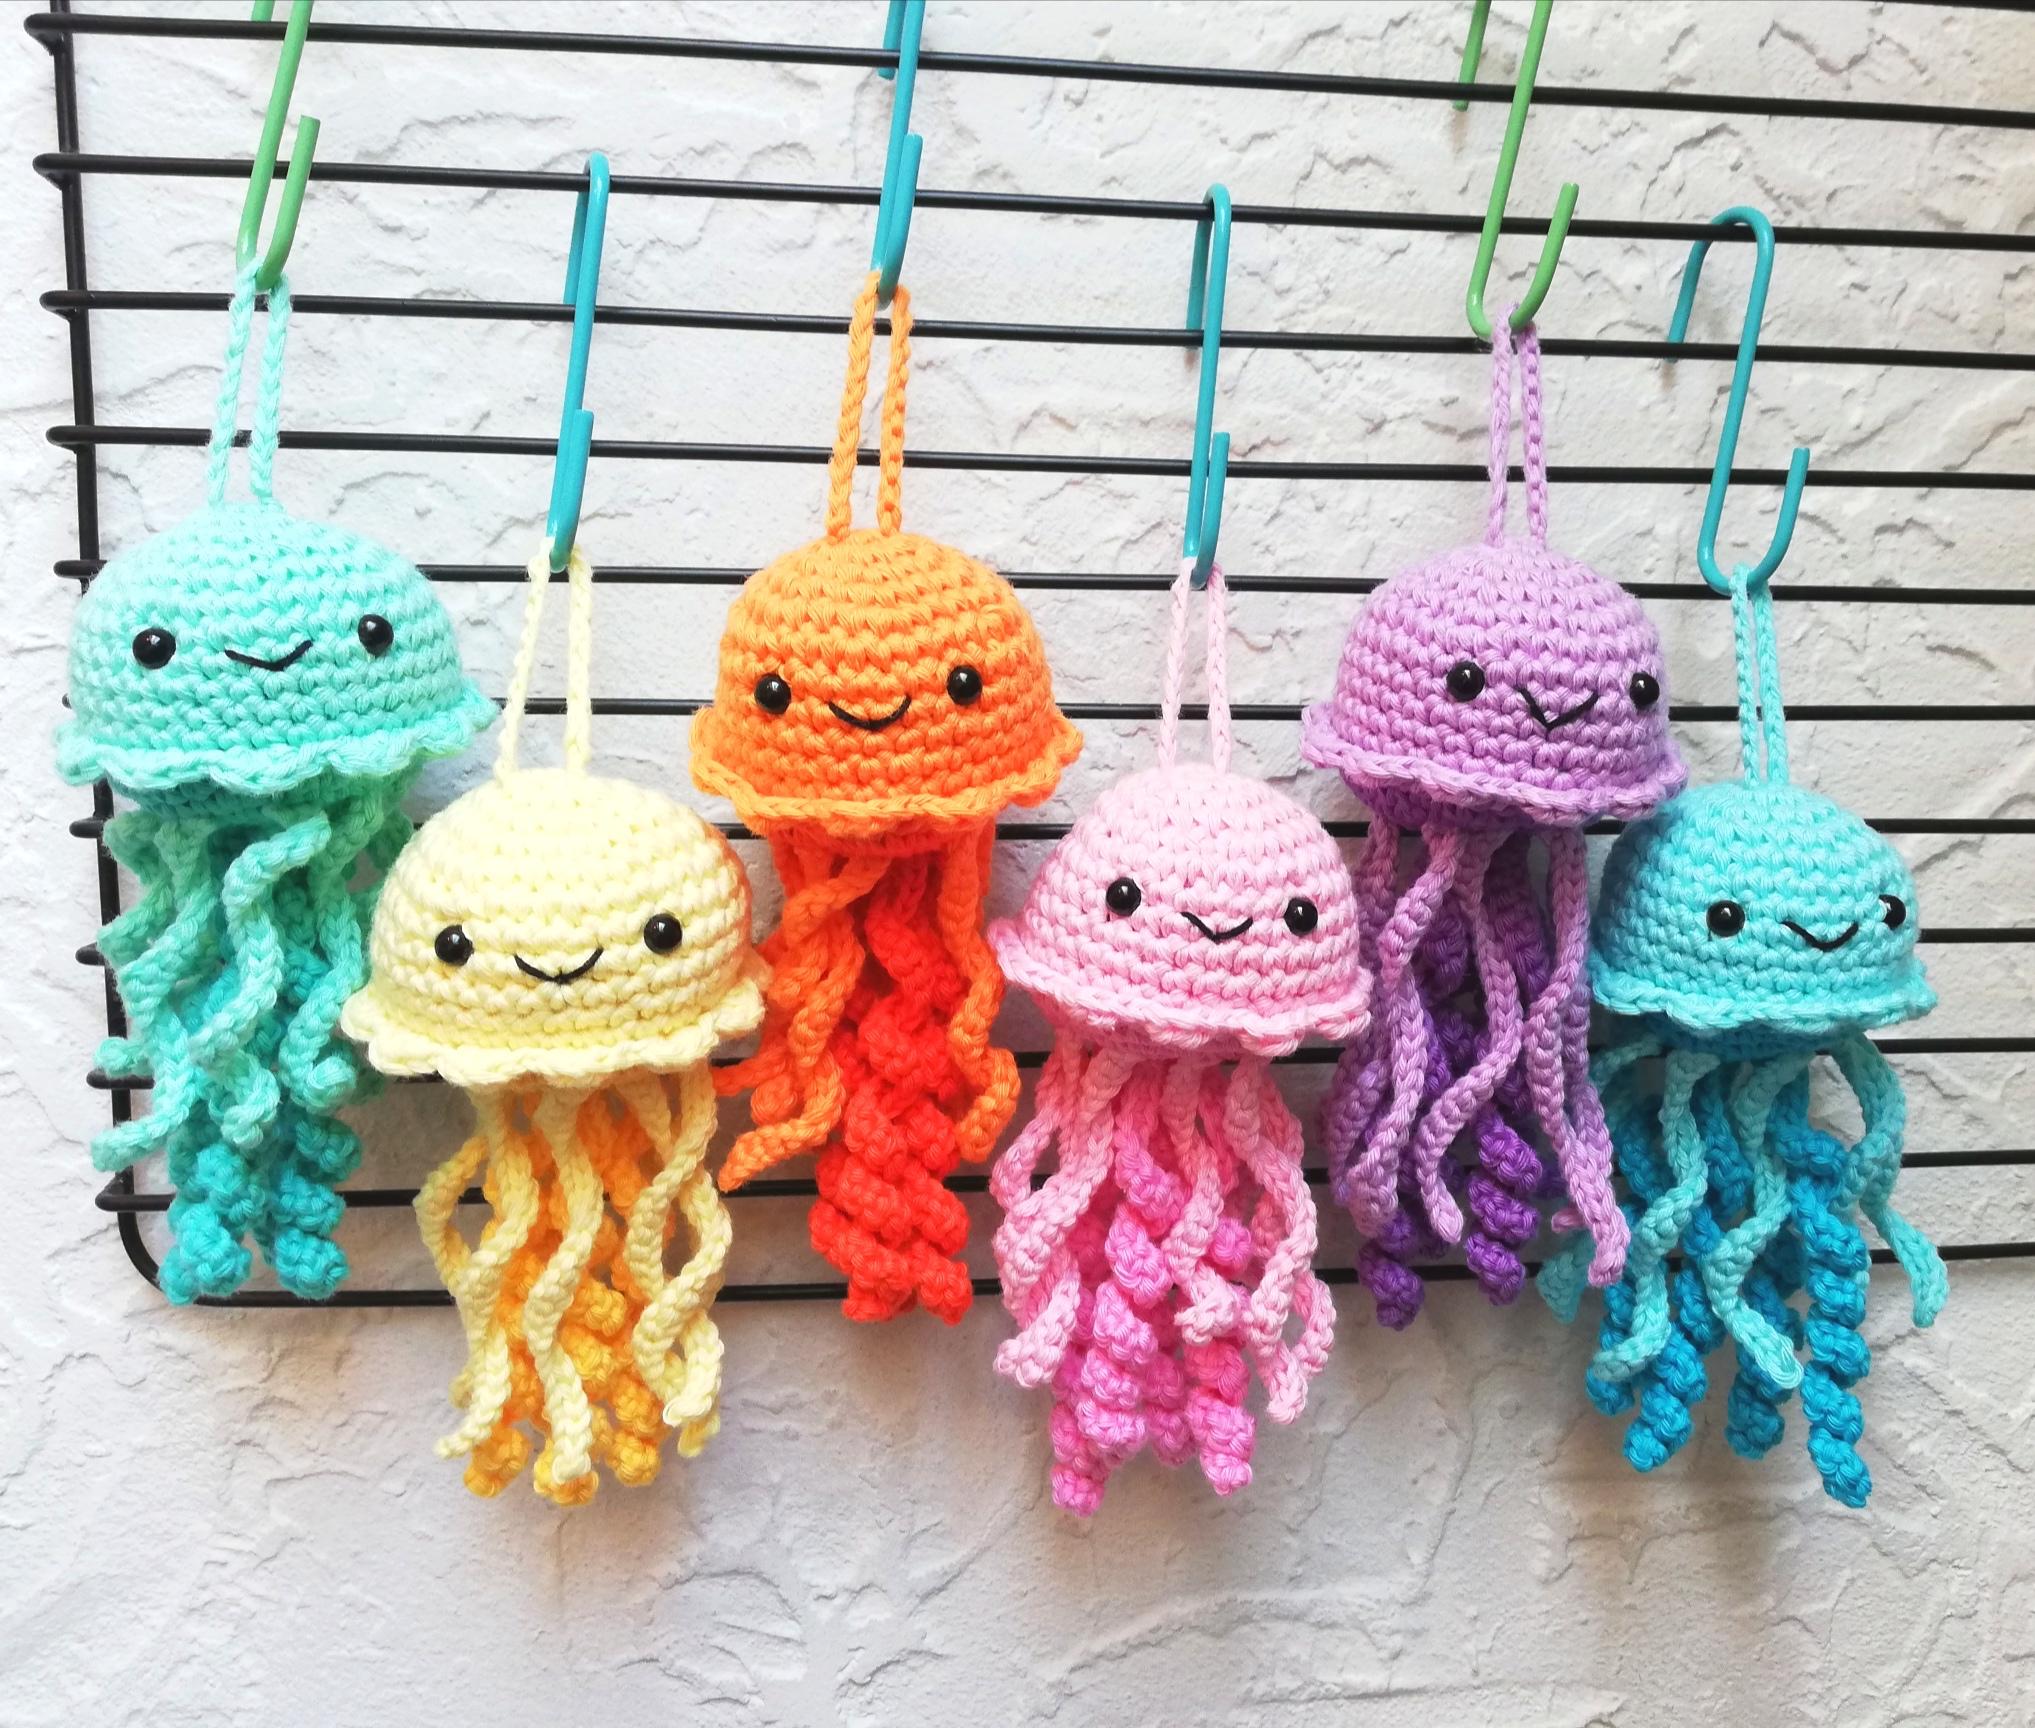 FULL PATTERN: Kawaii Cute Jellyfish Crochet Pattern (direct ... | 1728x2035